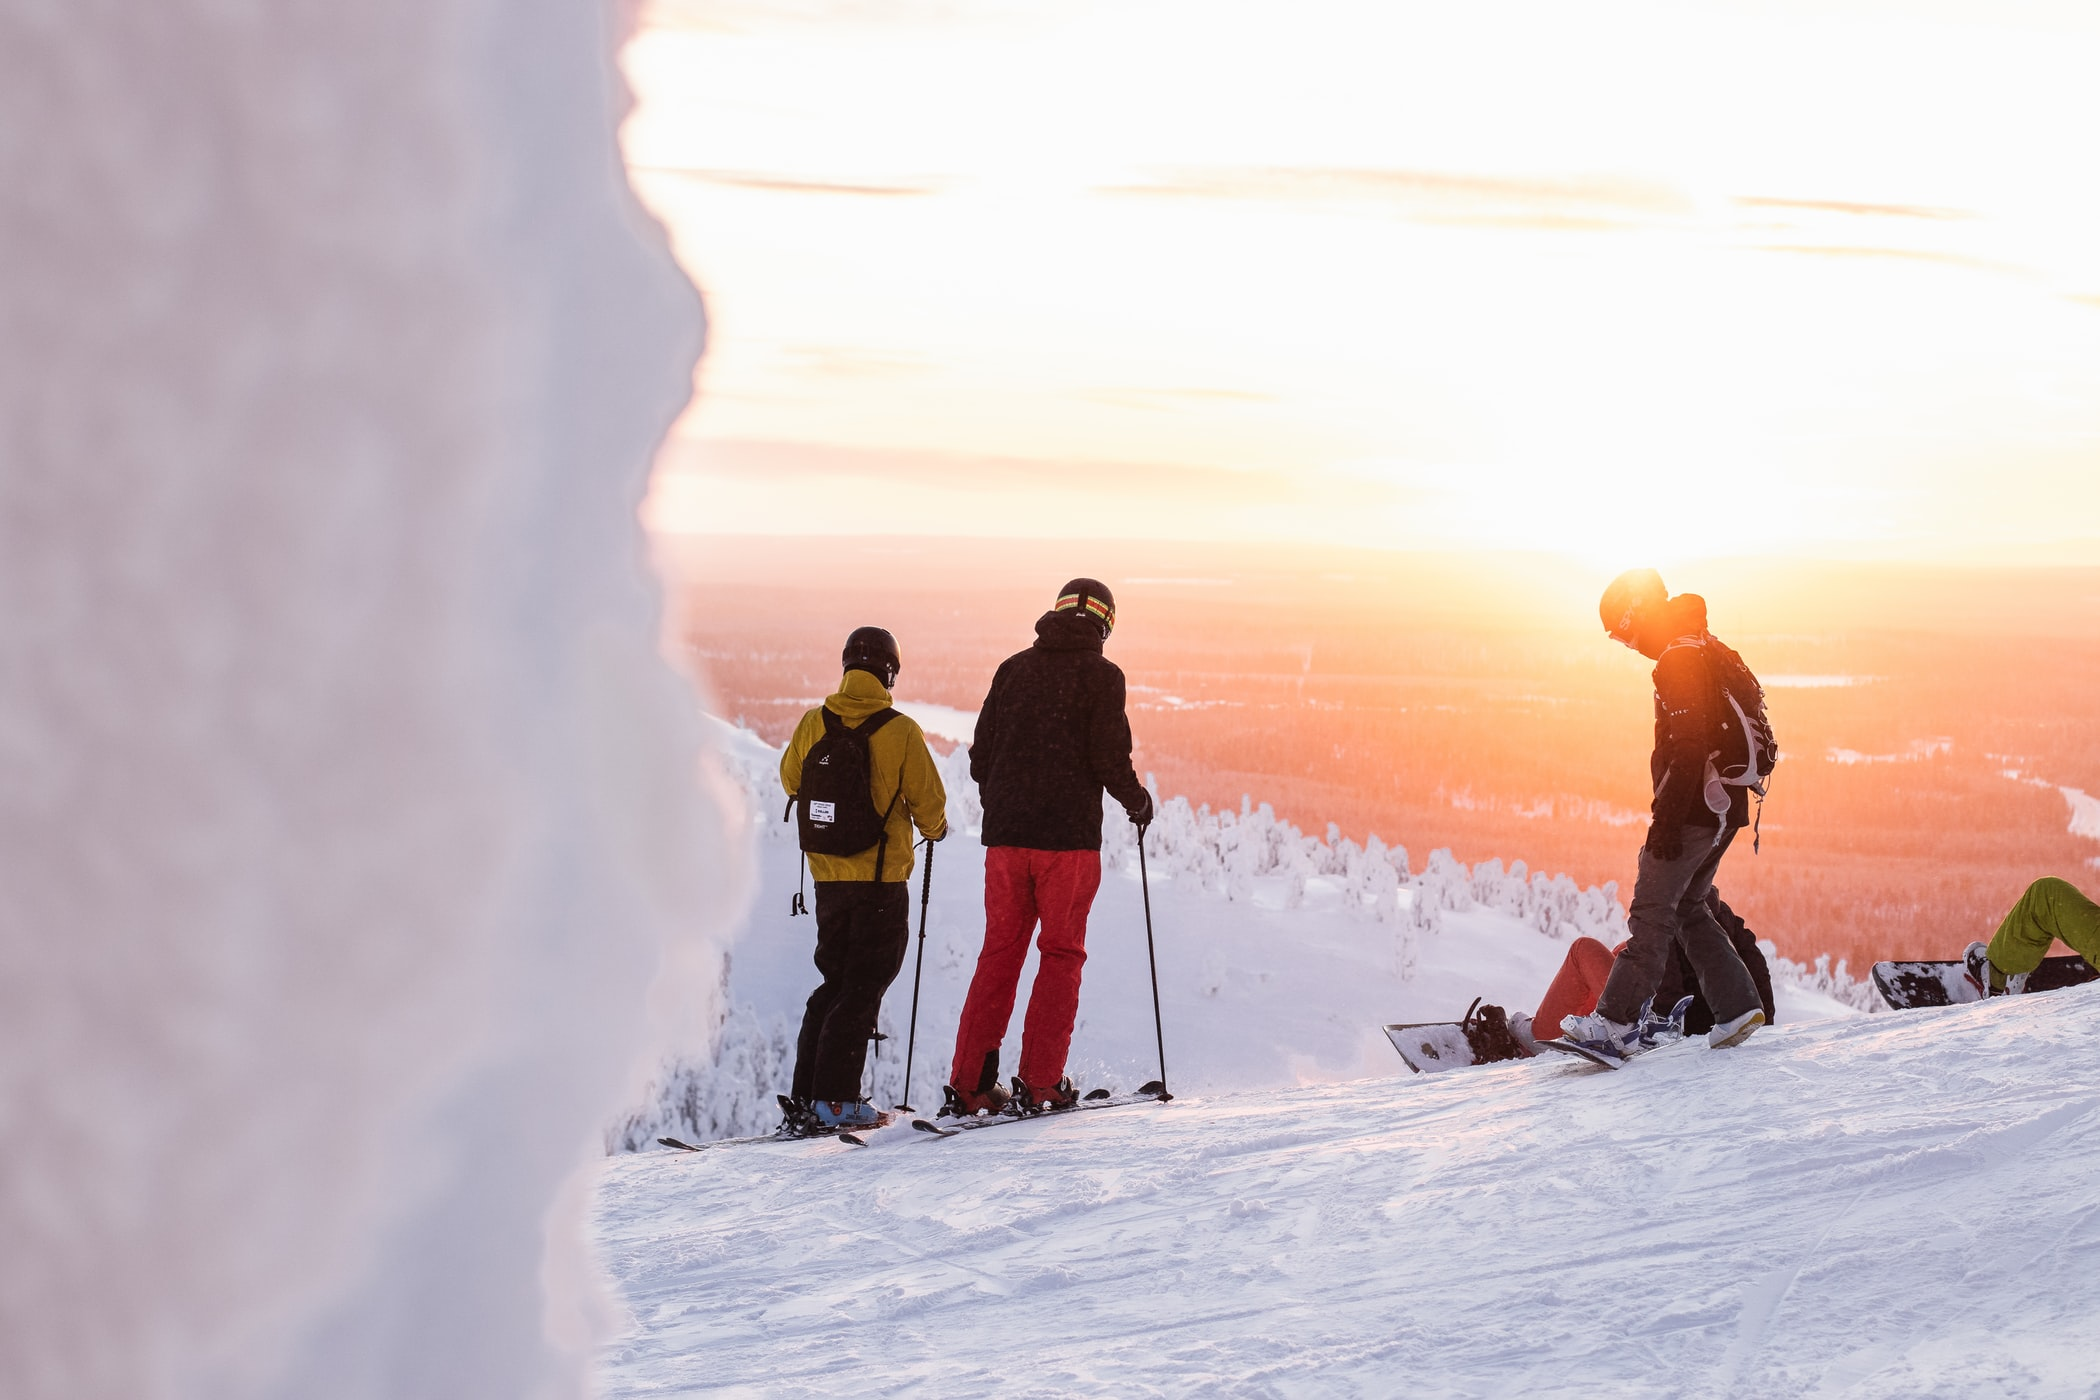 Ski resorts in Tyrol Austria